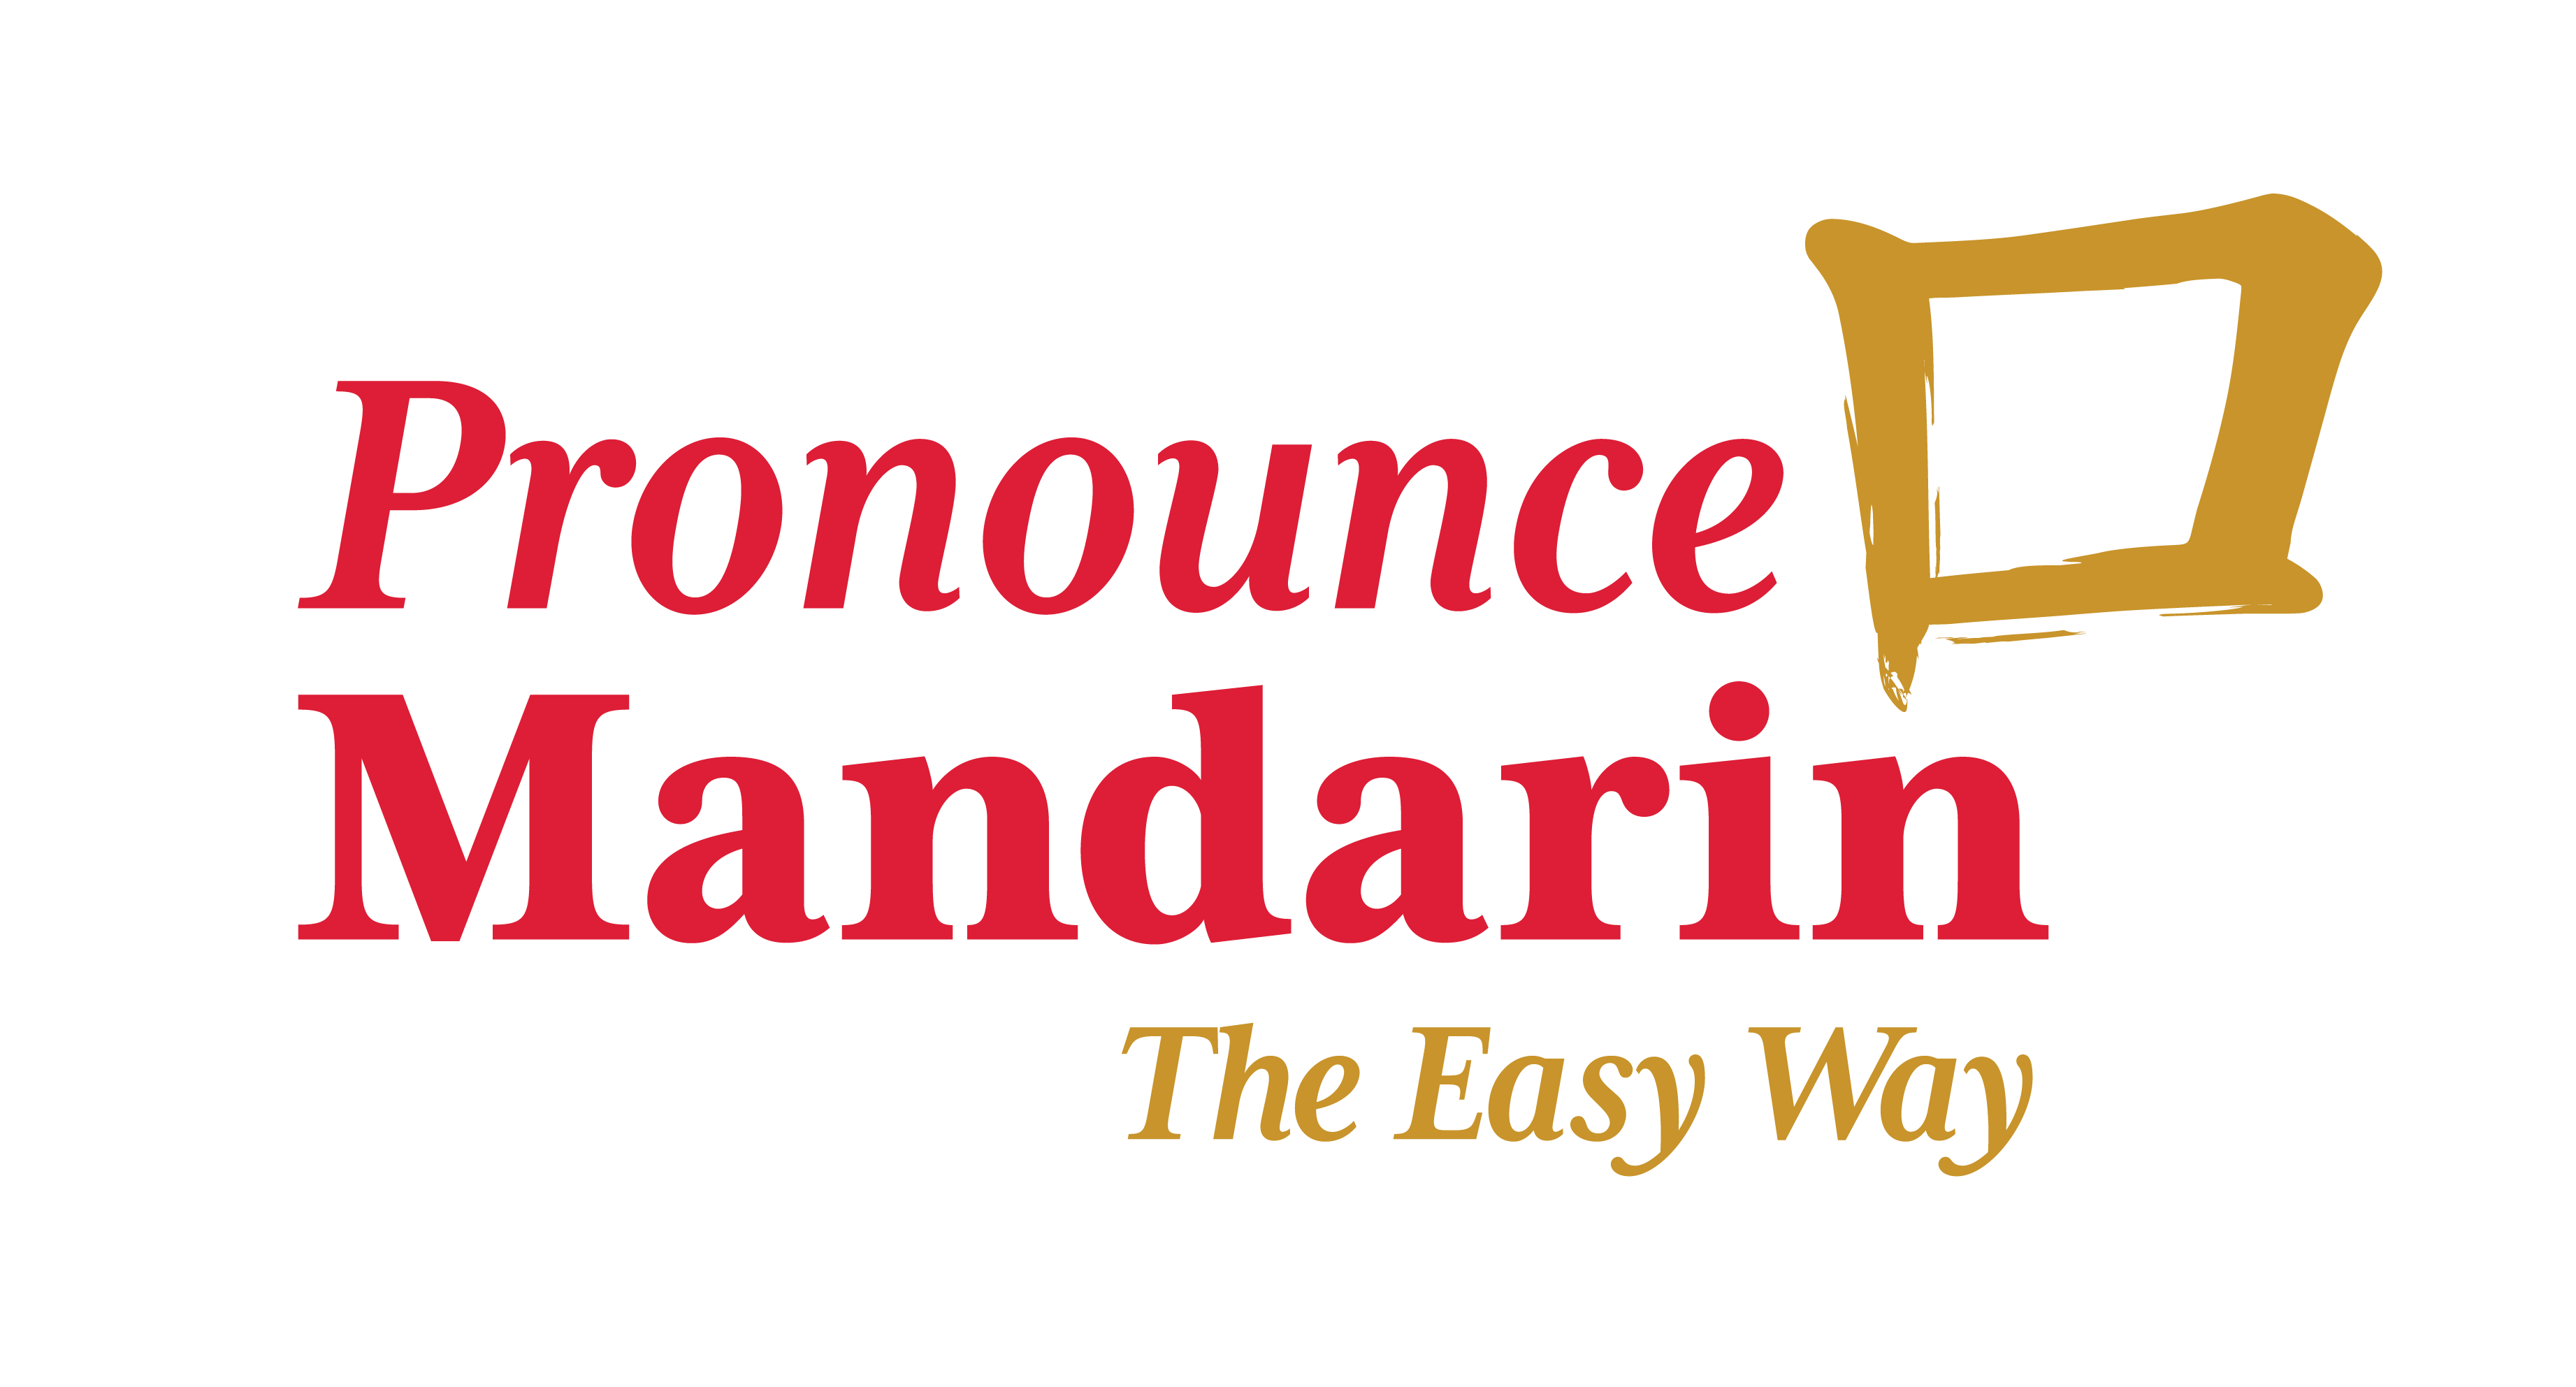 Pronounce Mandarin - The Easy Way